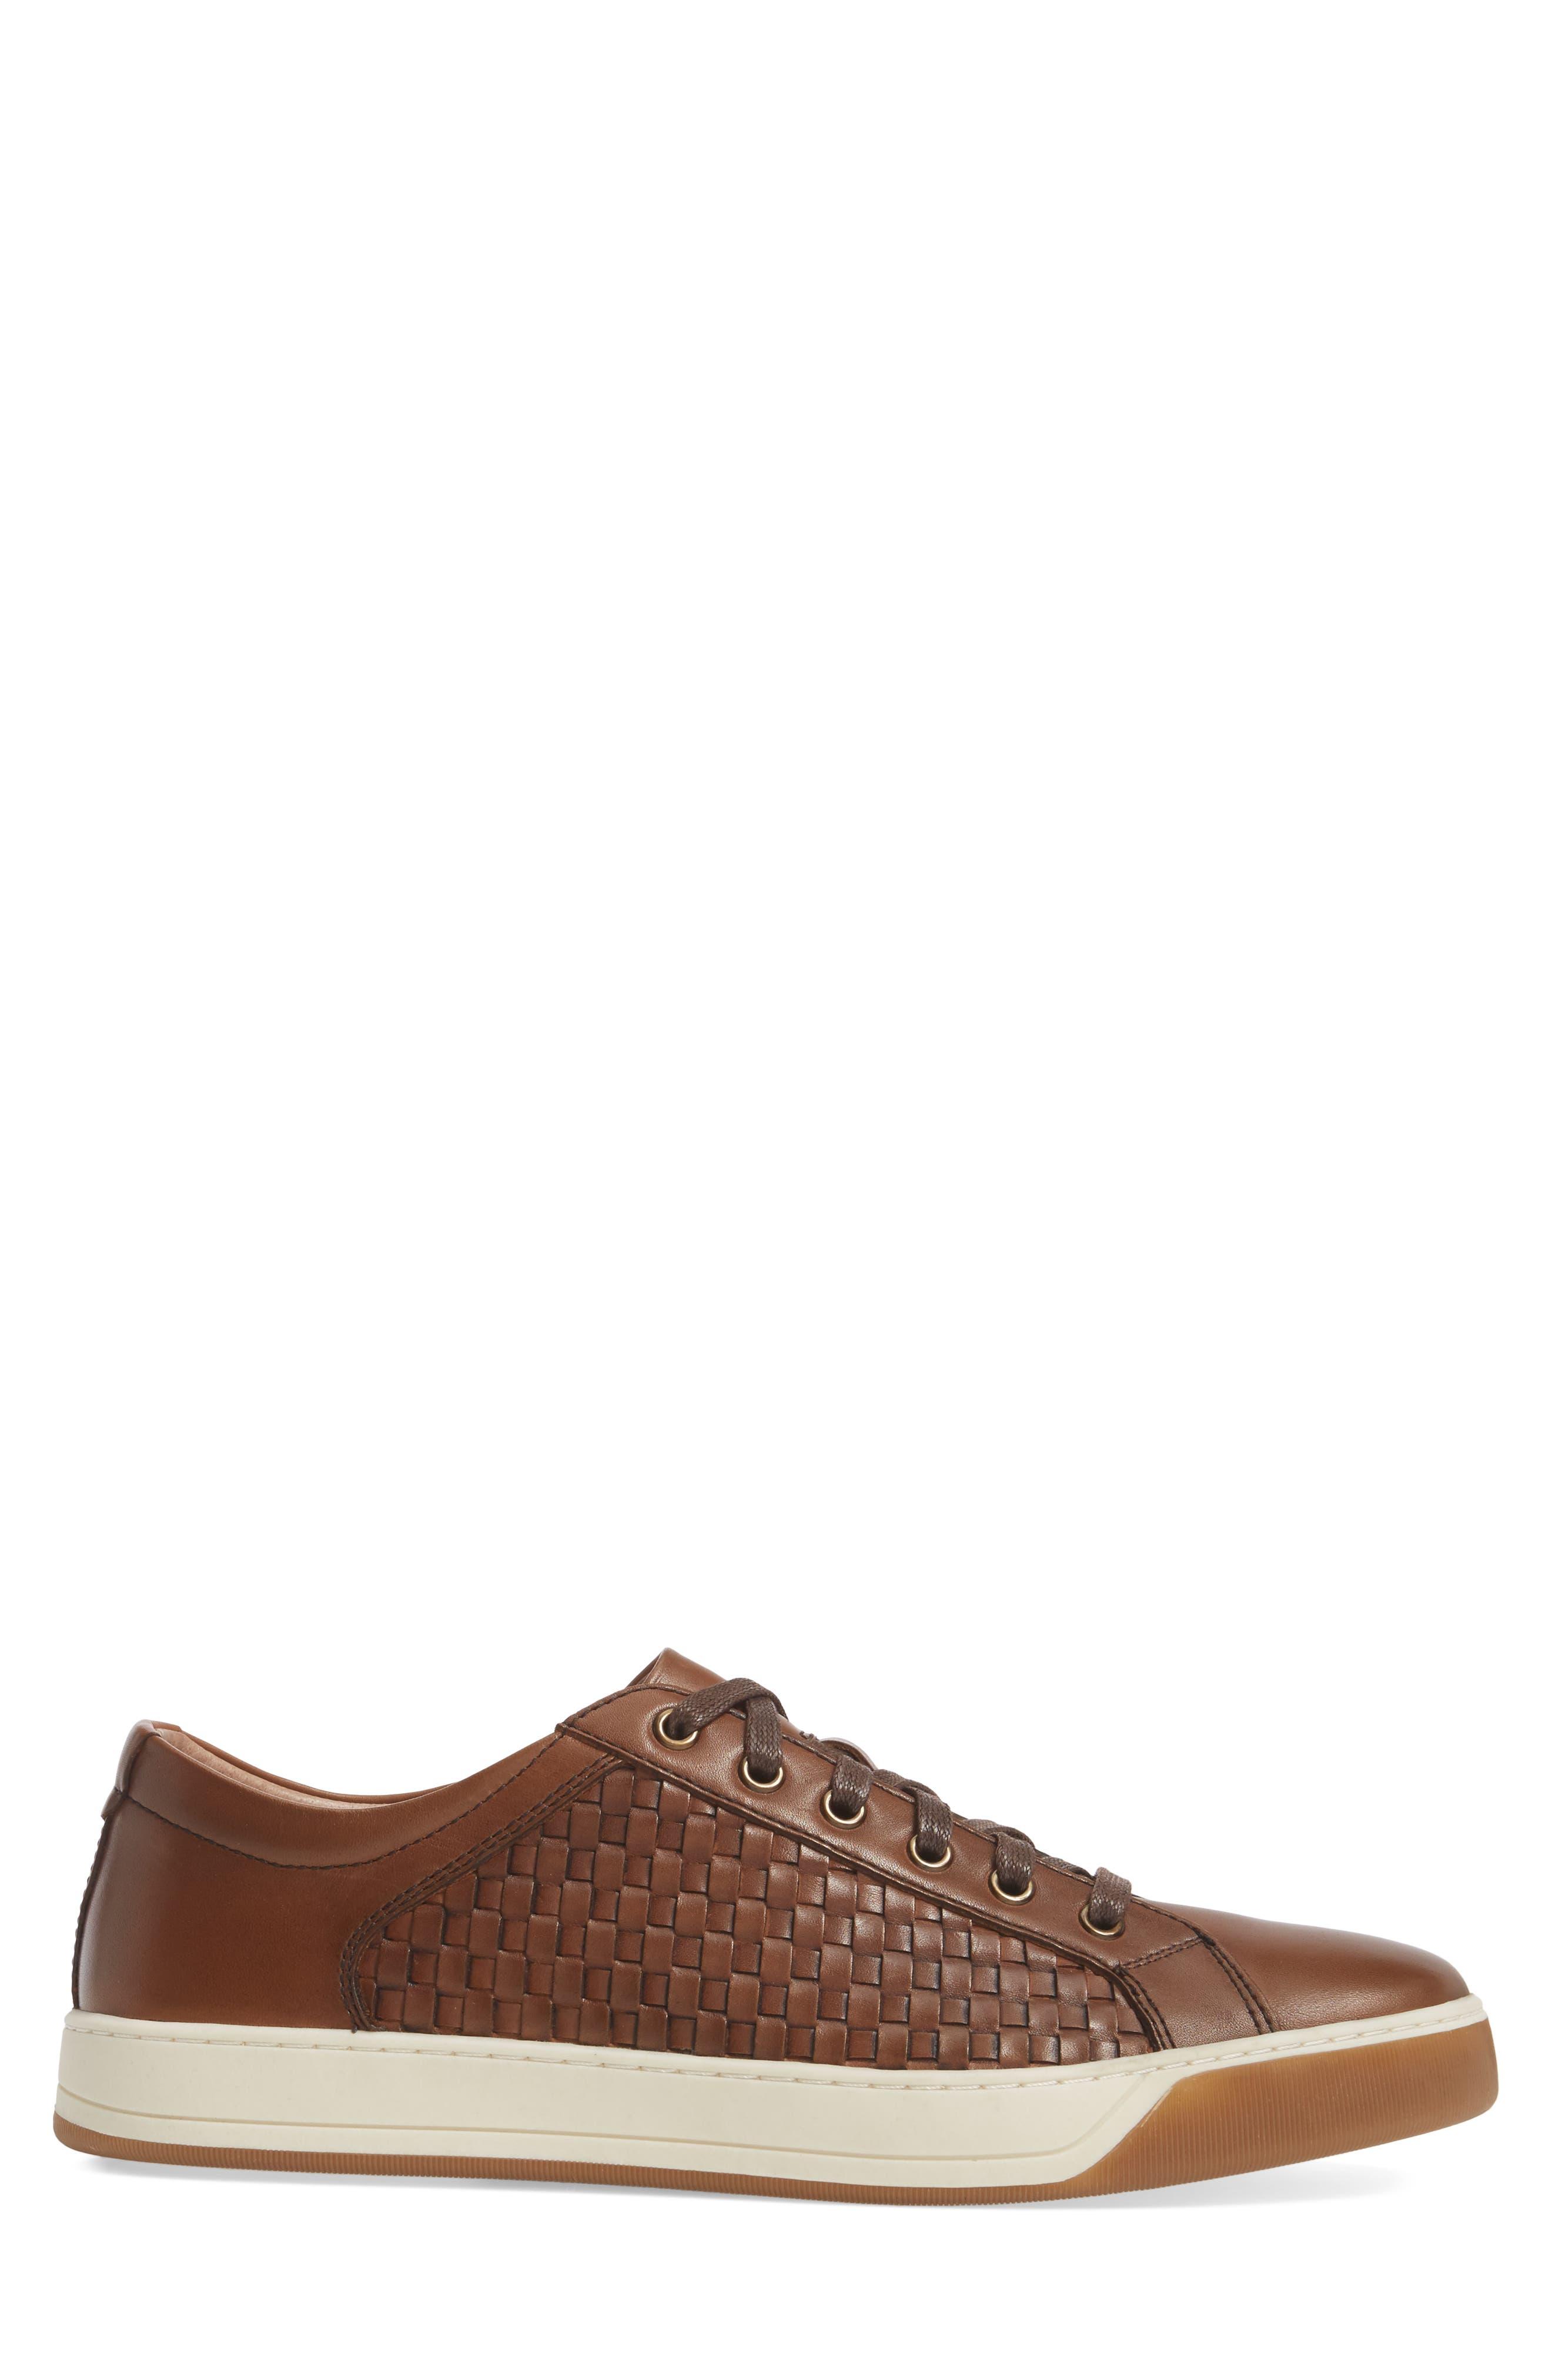 Alternate Image 3  - J&M 1850 Allister Woven Low Top Sneaker (Men)